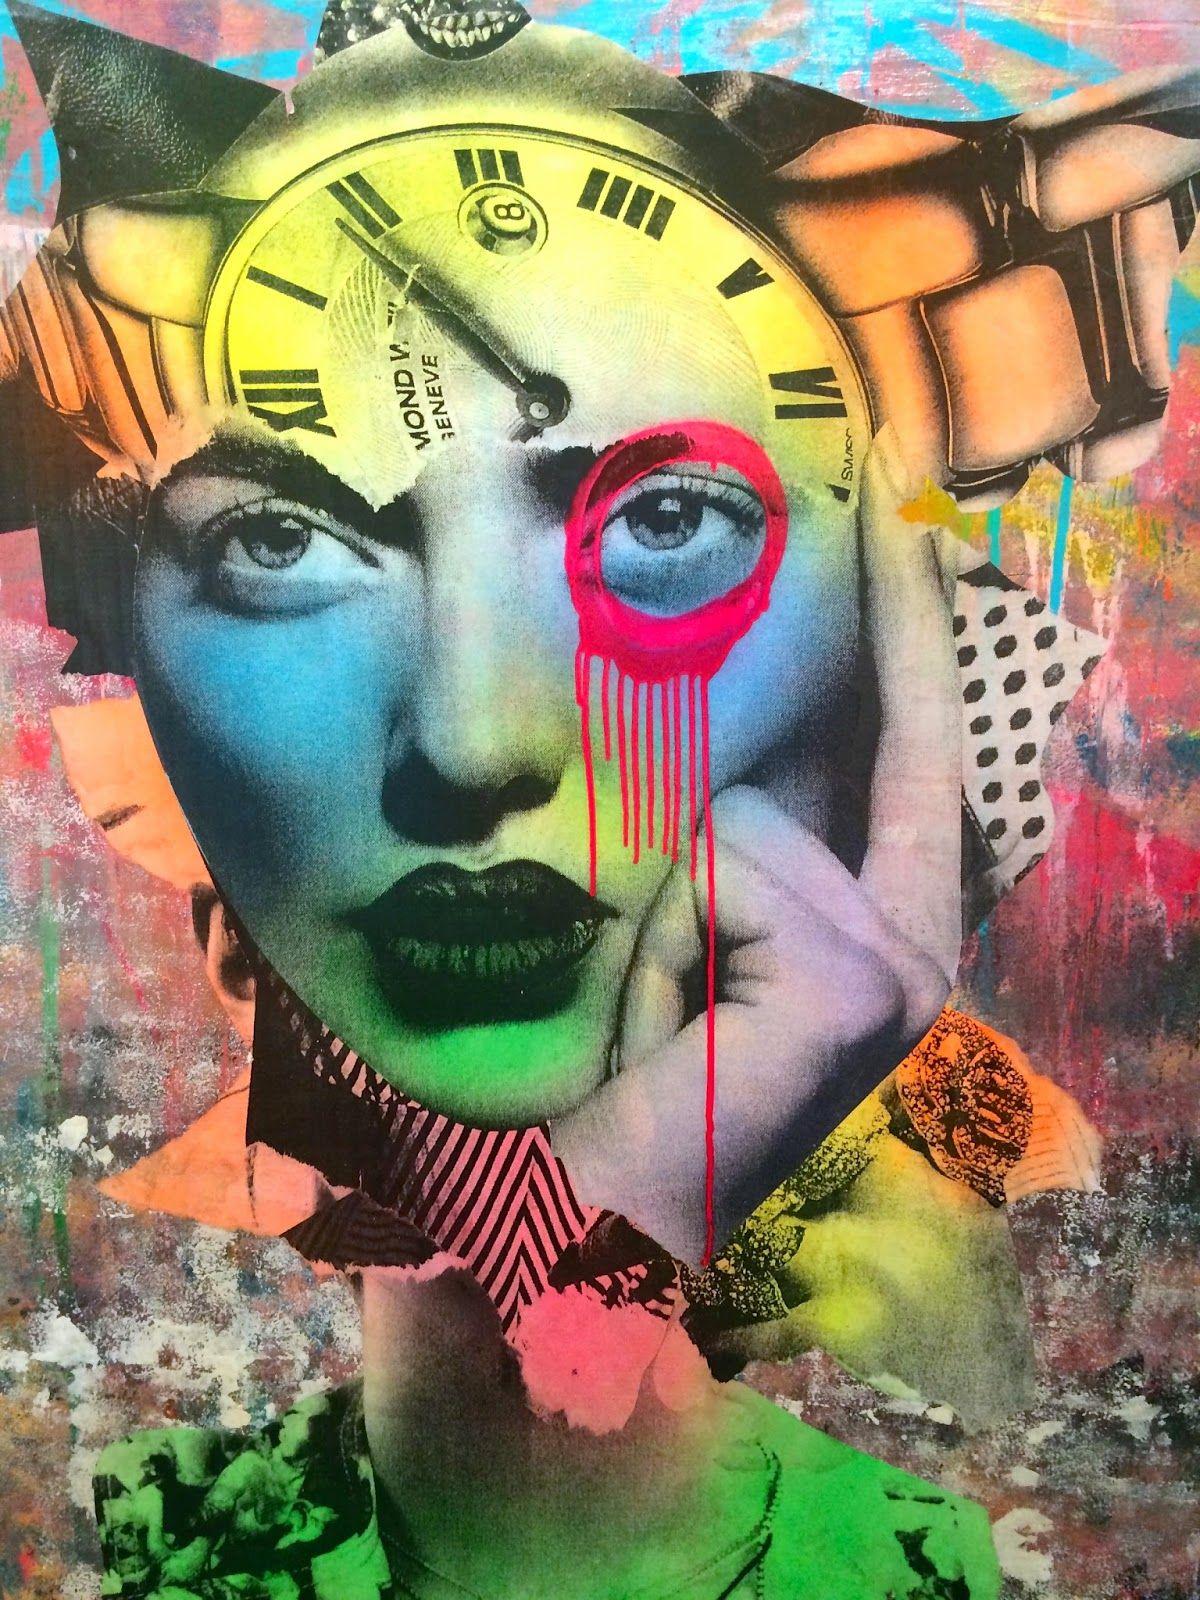 Artist: Ric Garcia / CREDIT: Ric Garcia Studio